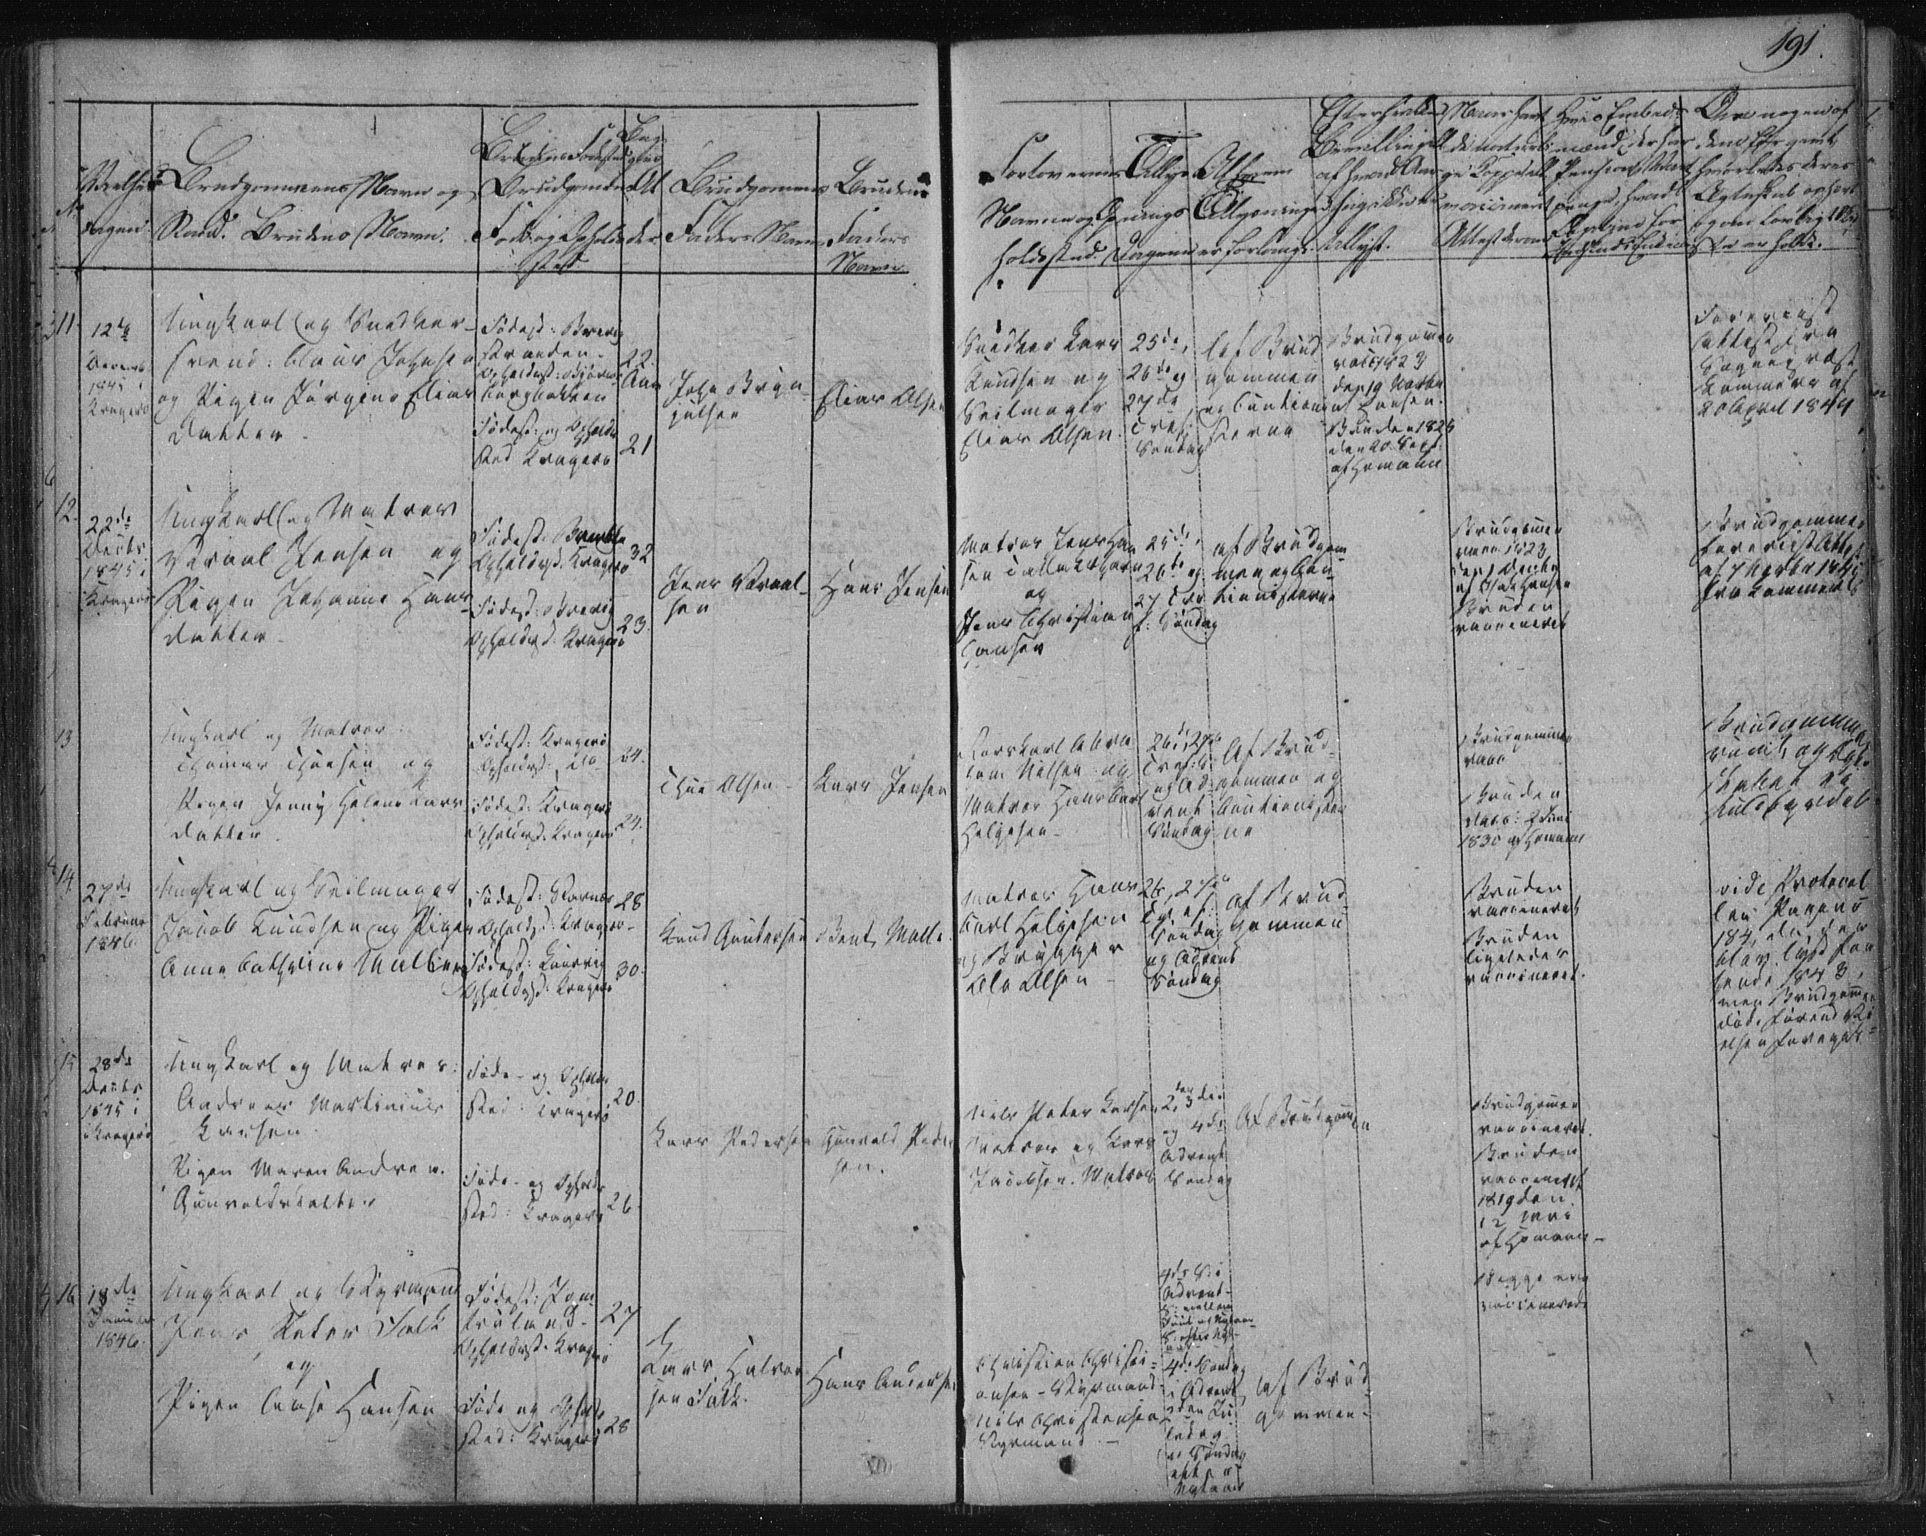 SAKO, Kragerø kirkebøker, F/Fa/L0005: Ministerialbok nr. 5, 1832-1847, s. 191